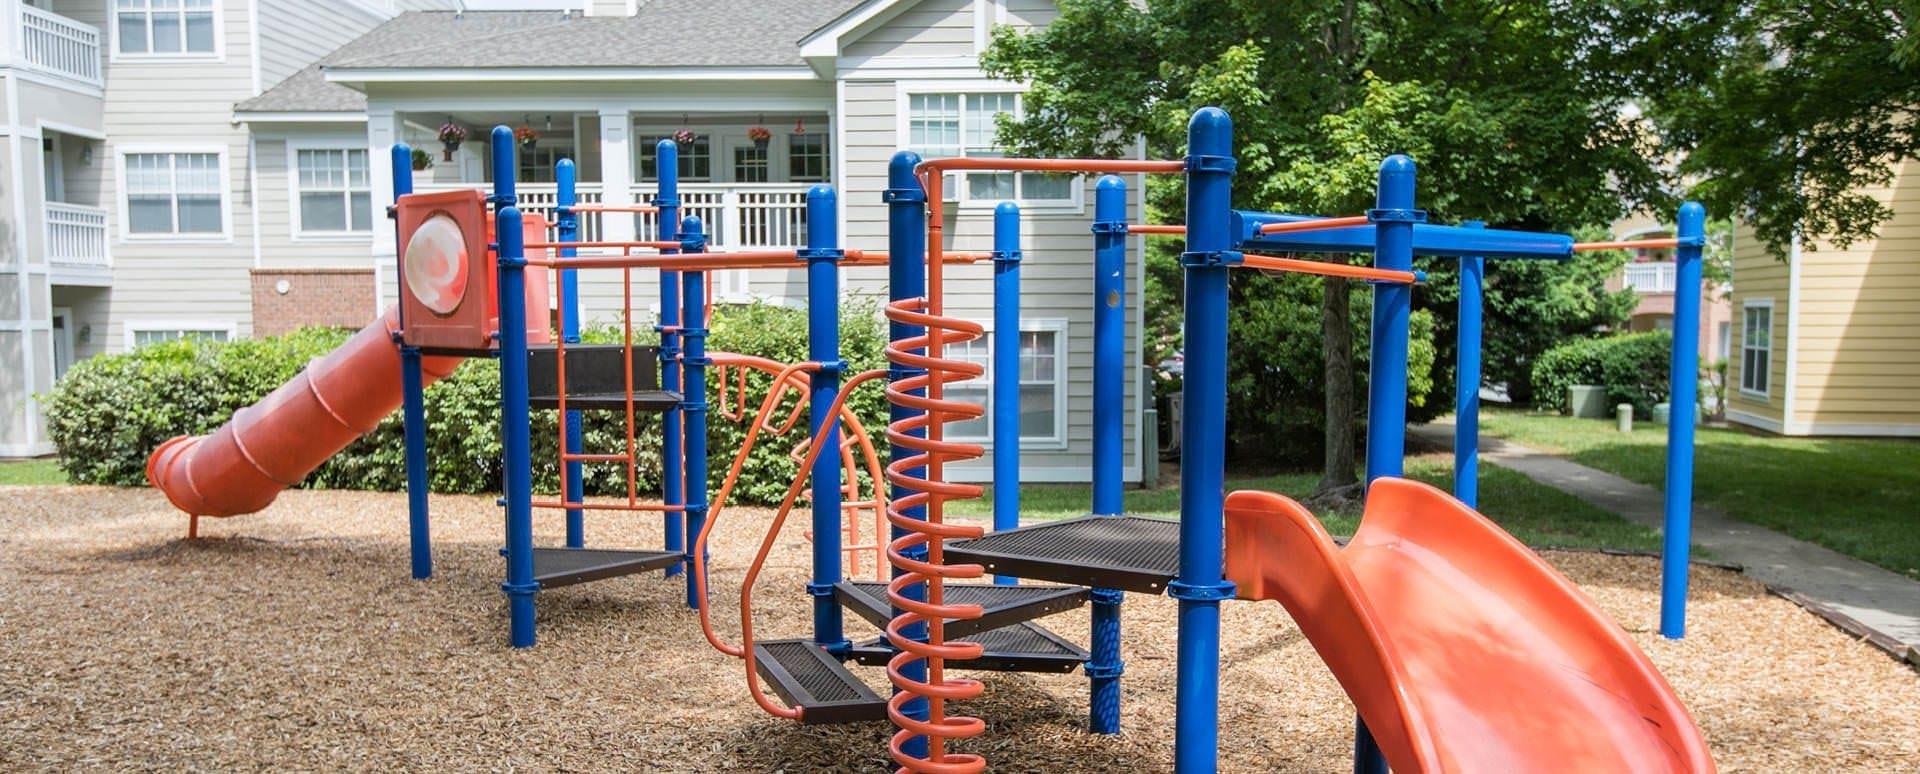 children's playground with jungle gym equipment